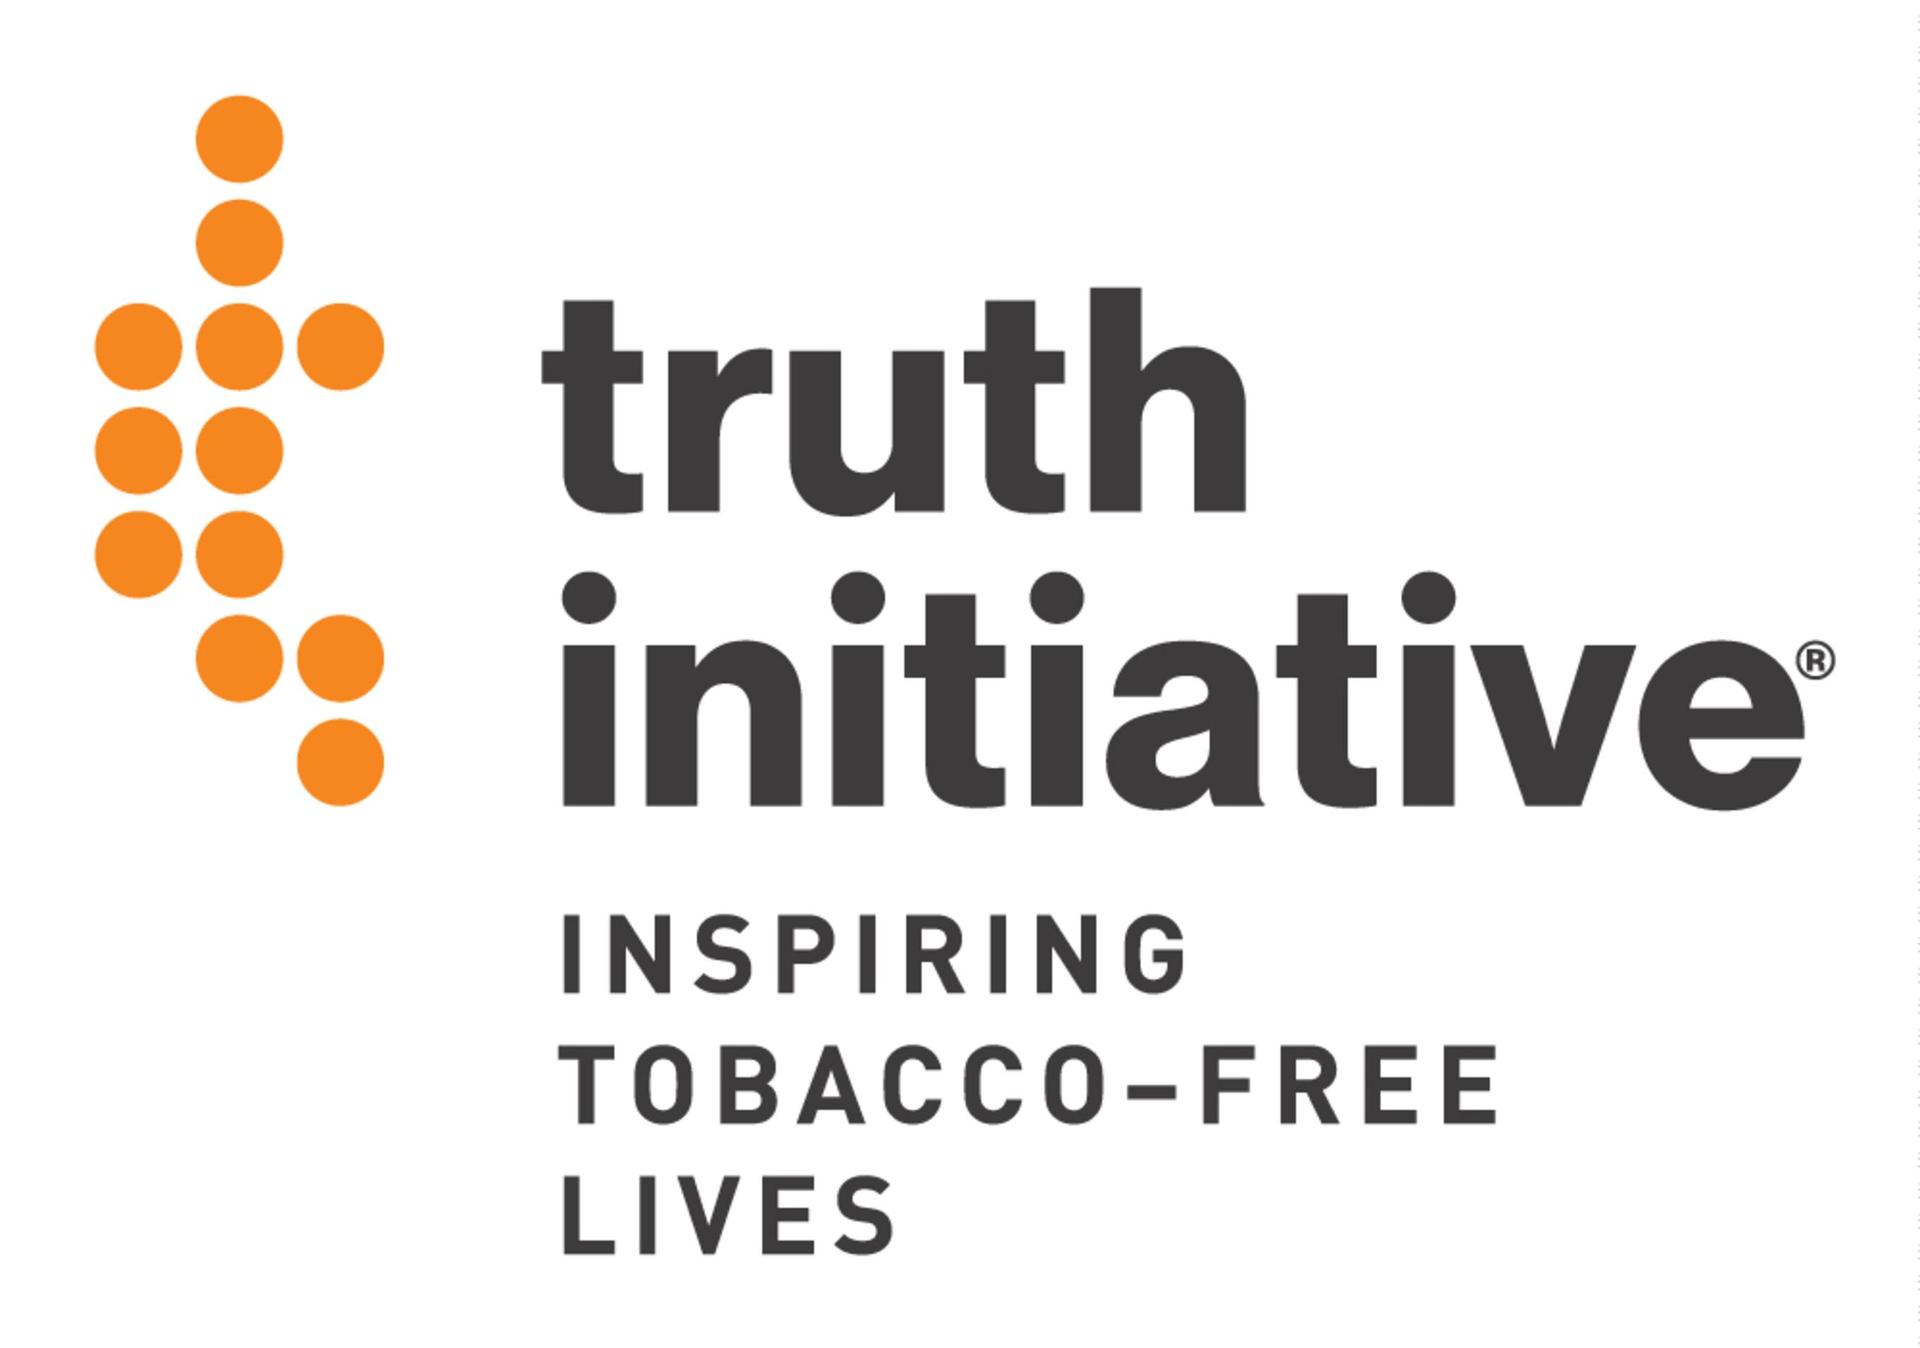 truth iniative logo